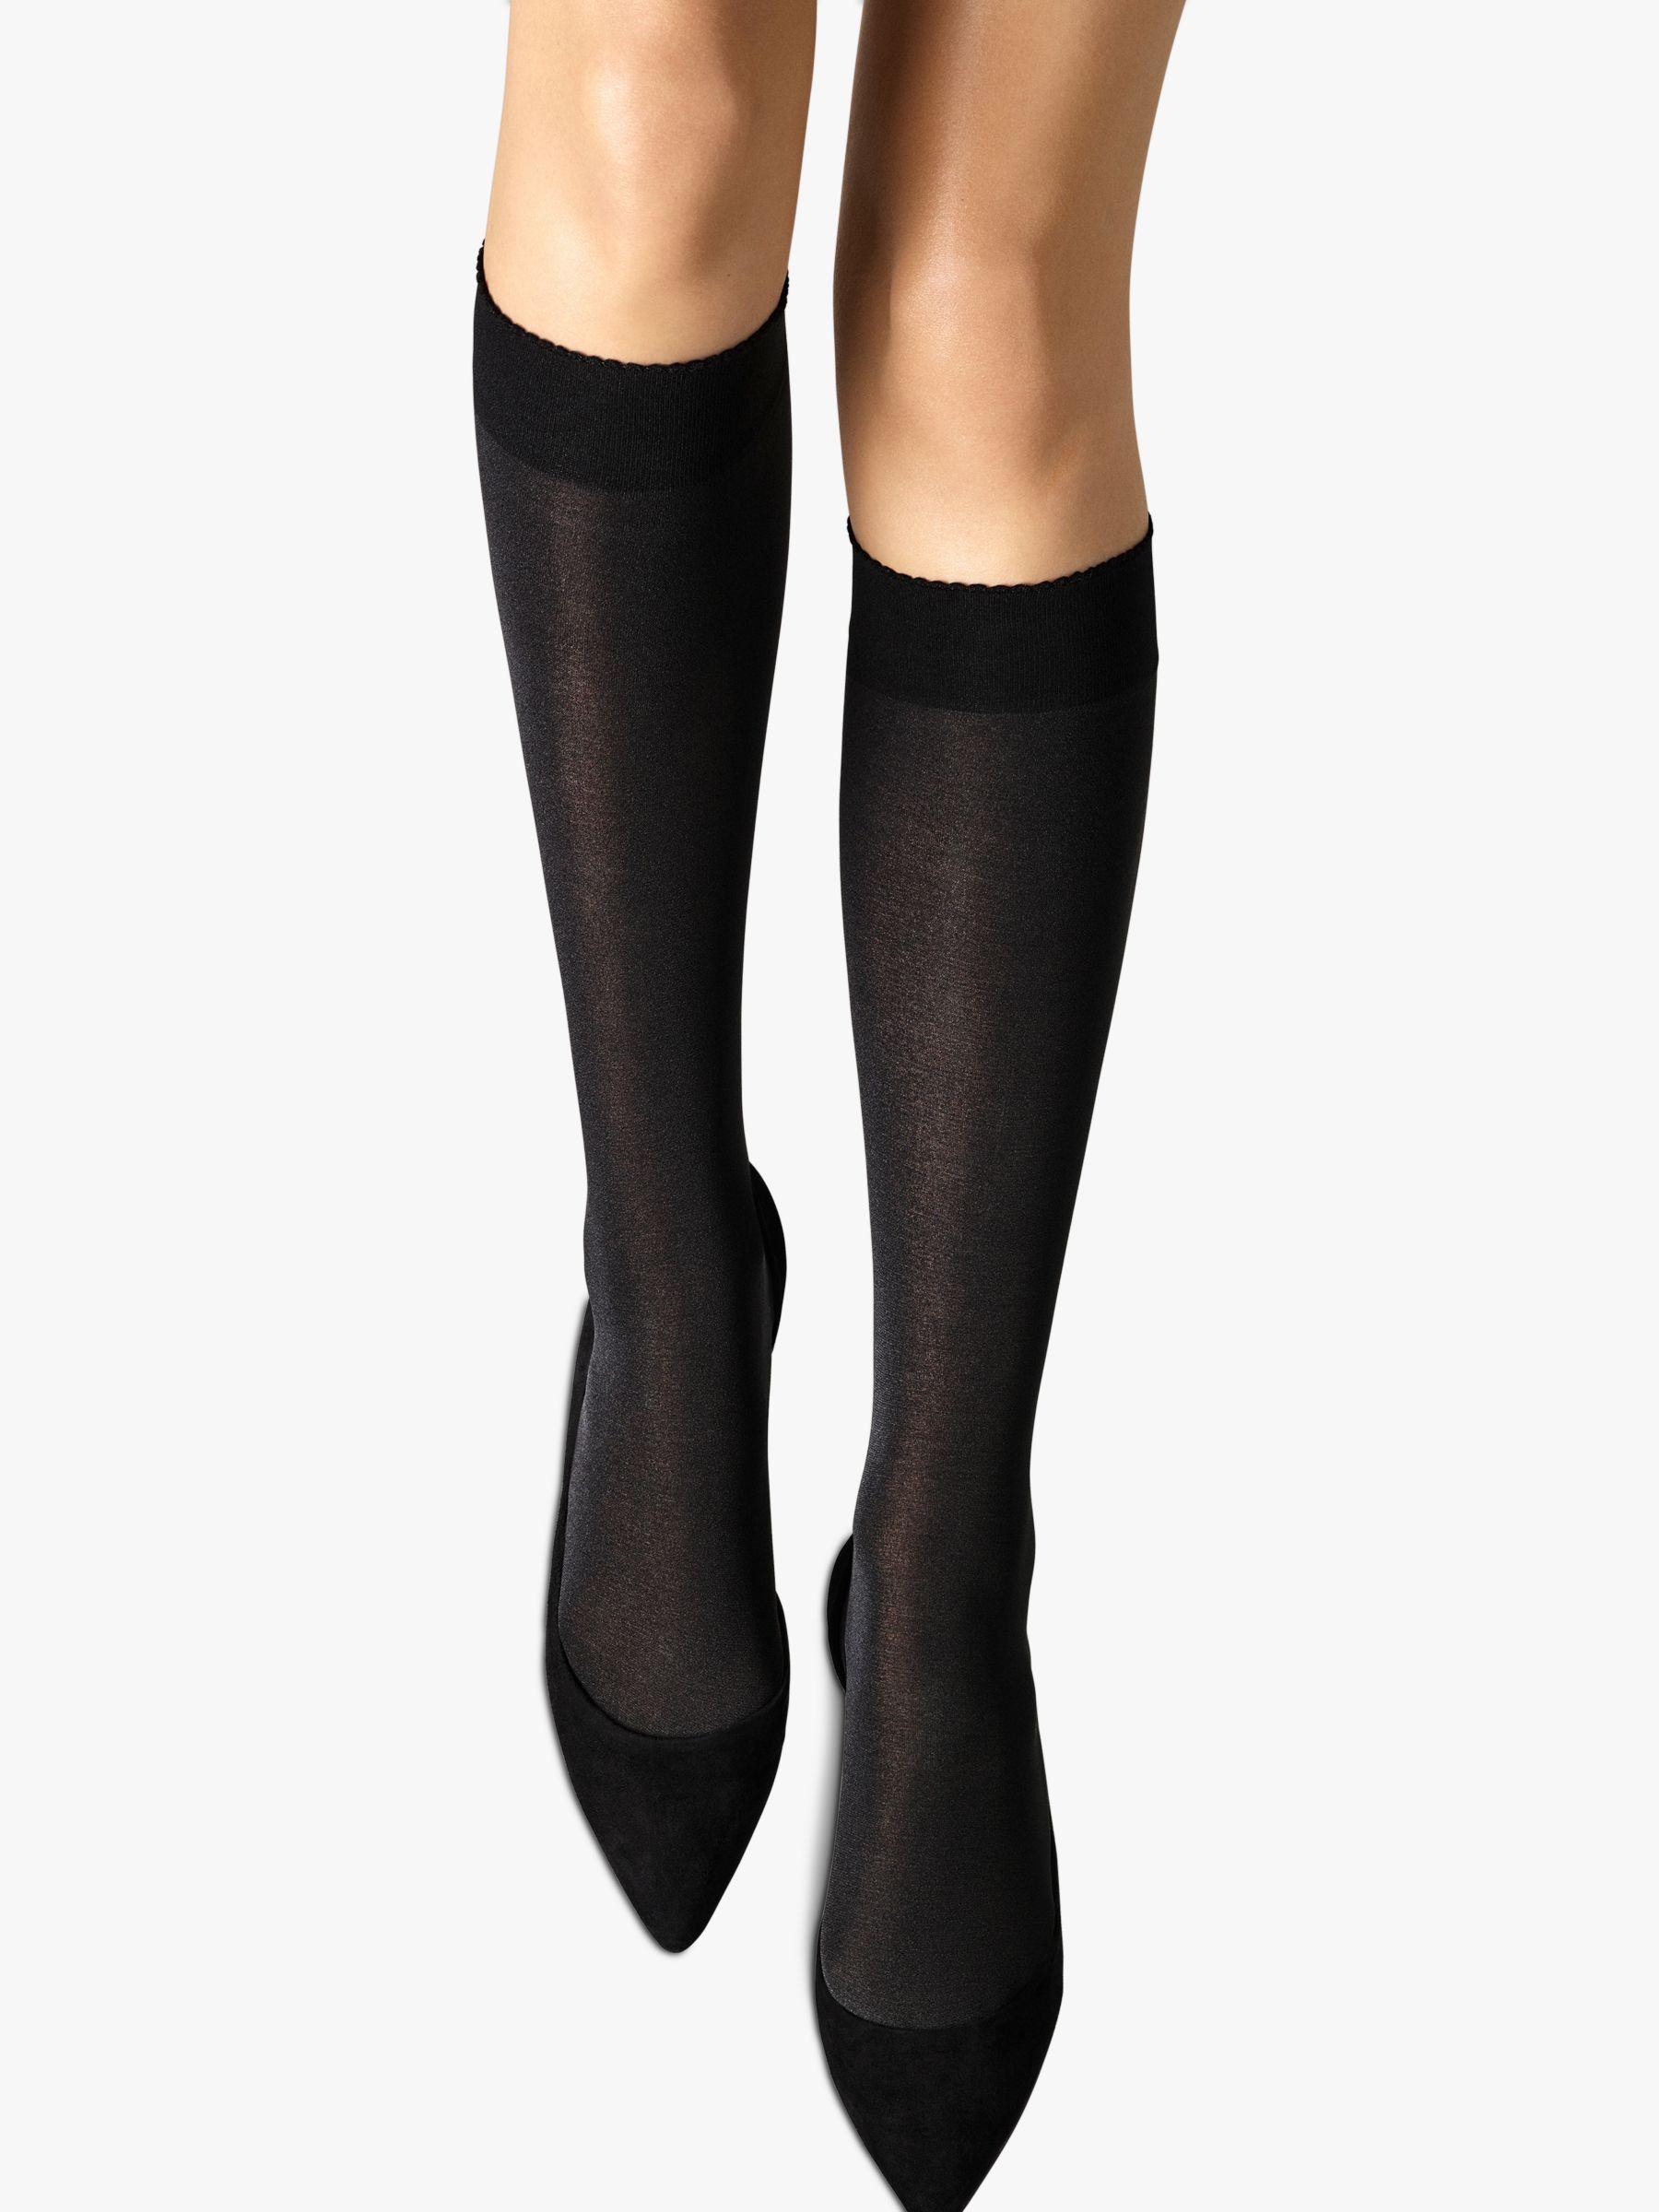 Wolford Wolford Velvet de Luxe 50 Knee Highs, Black